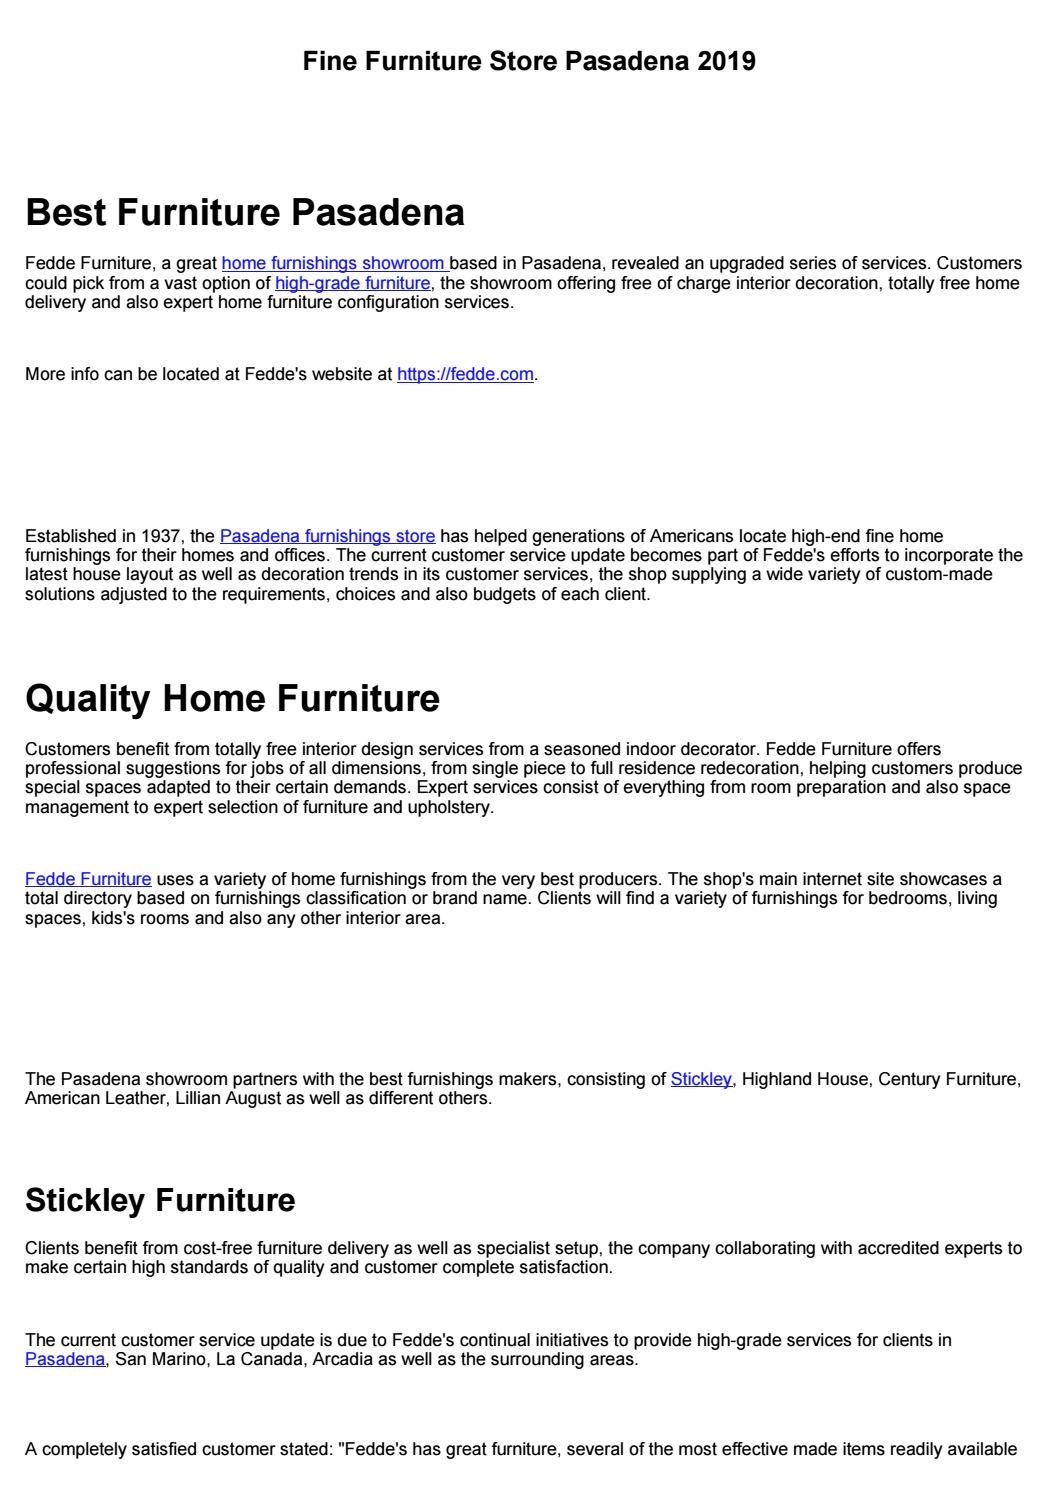 High Quality Furniture Pasadena 2019 By Perillouxlen1961 Issuu